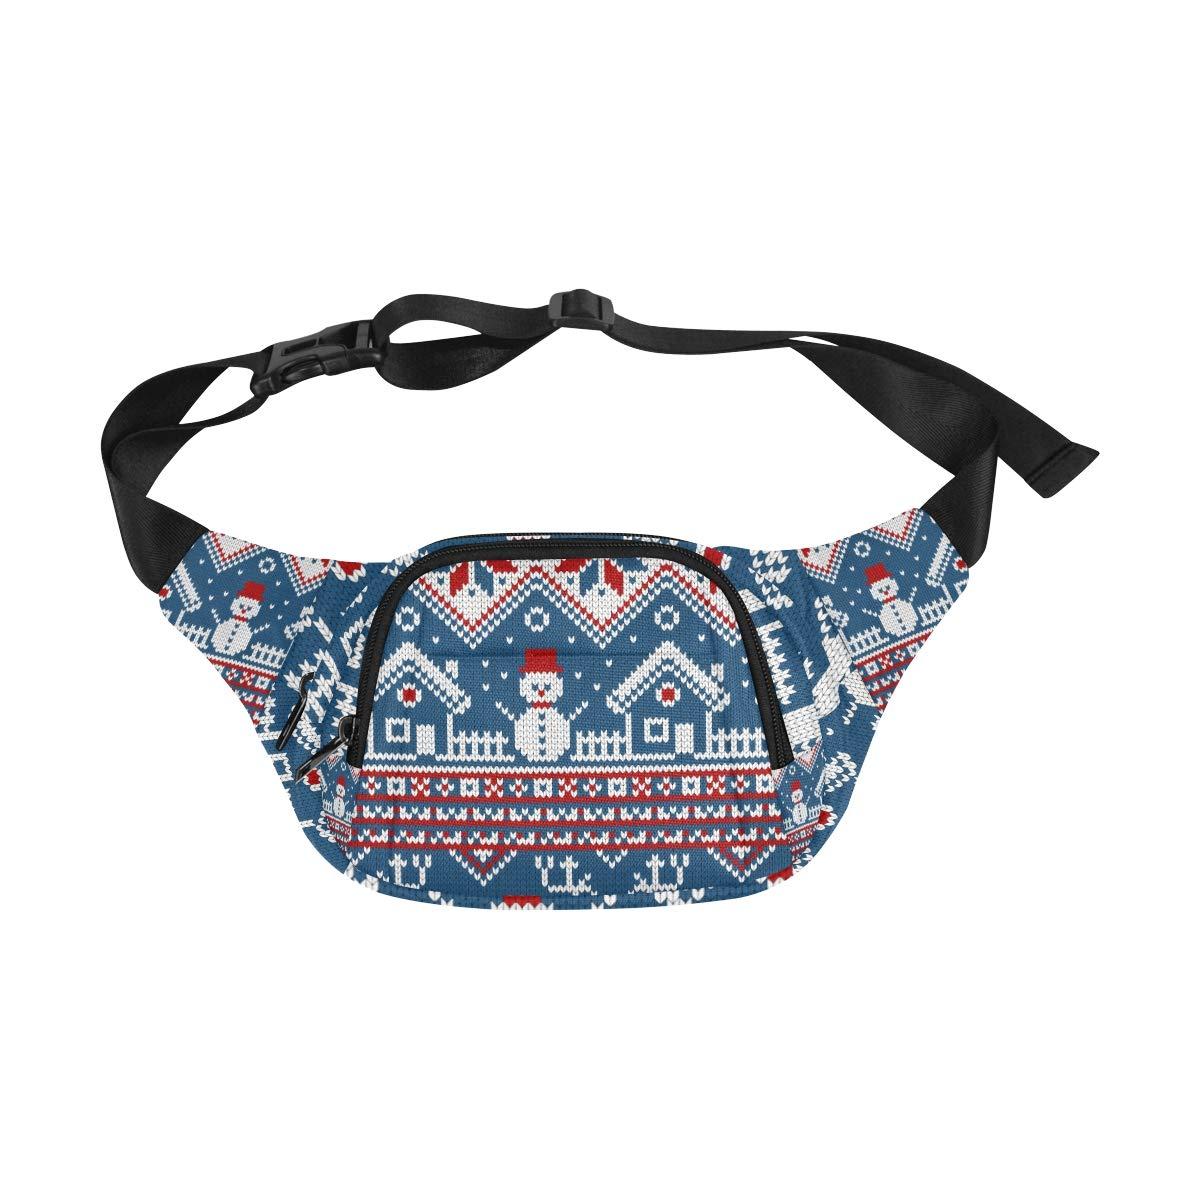 Knit Reindeer Star And Snowflake Fenny Packs Waist Bags Adjustable Belt Waterproof Nylon Travel Running Sport Vacation Party For Men Women Boys Girls Kids